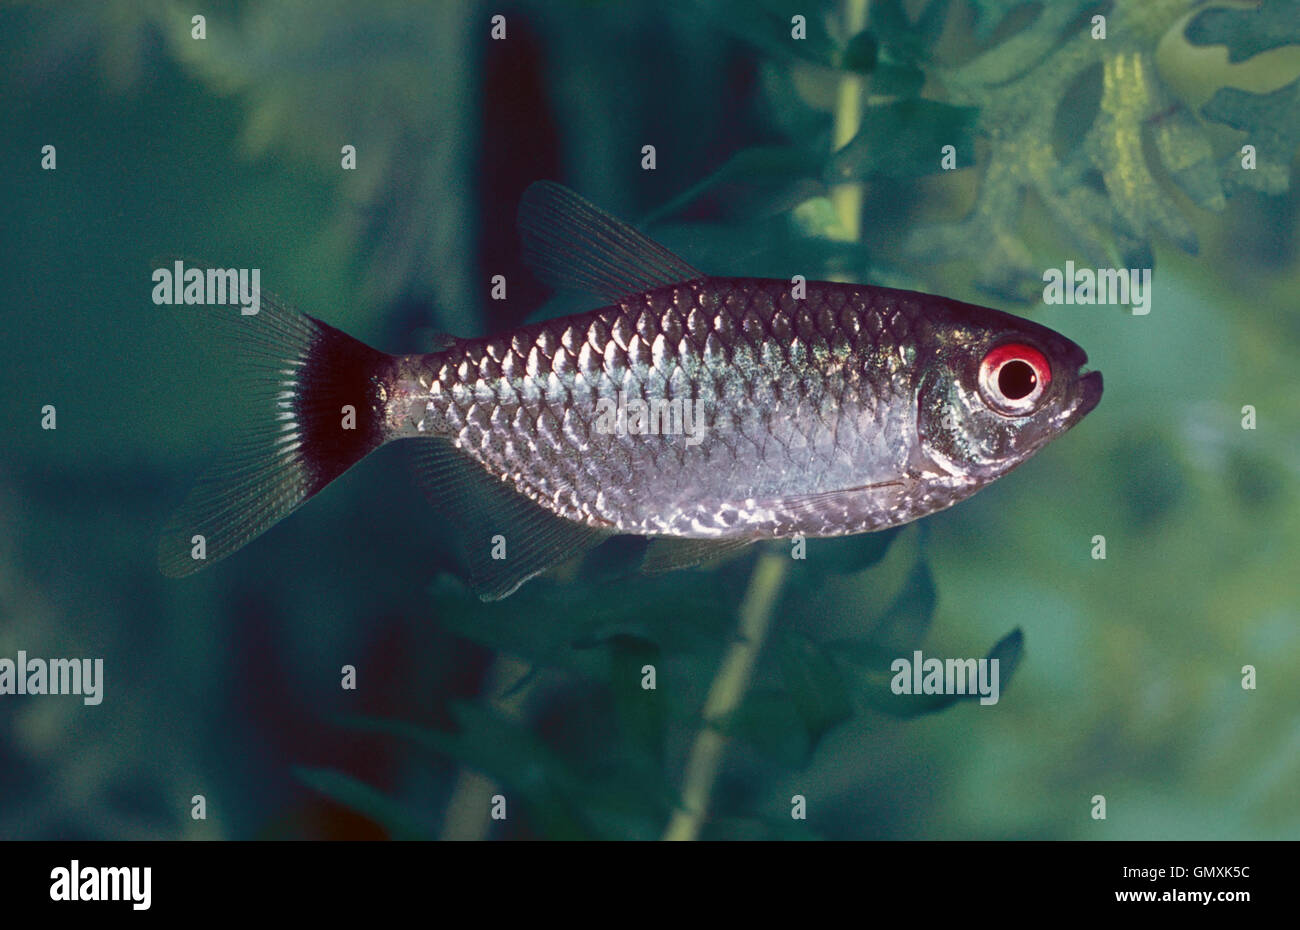 Red Eye Tetra, Moenkhausia sanctaefilomenae.  Aquarium fish - Stock Image